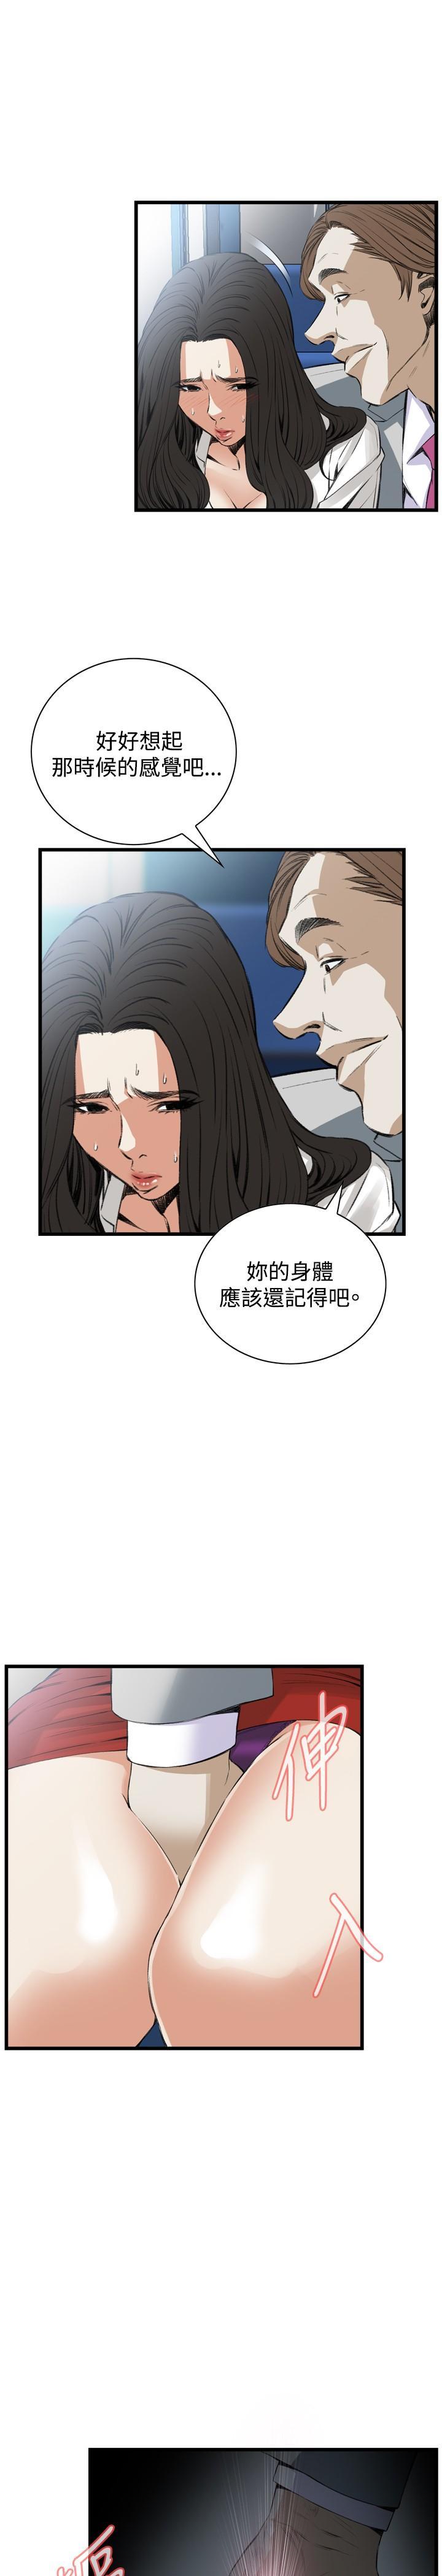 Take a Peek 偷窥 Ch.39~51 [Chinese]中文 322